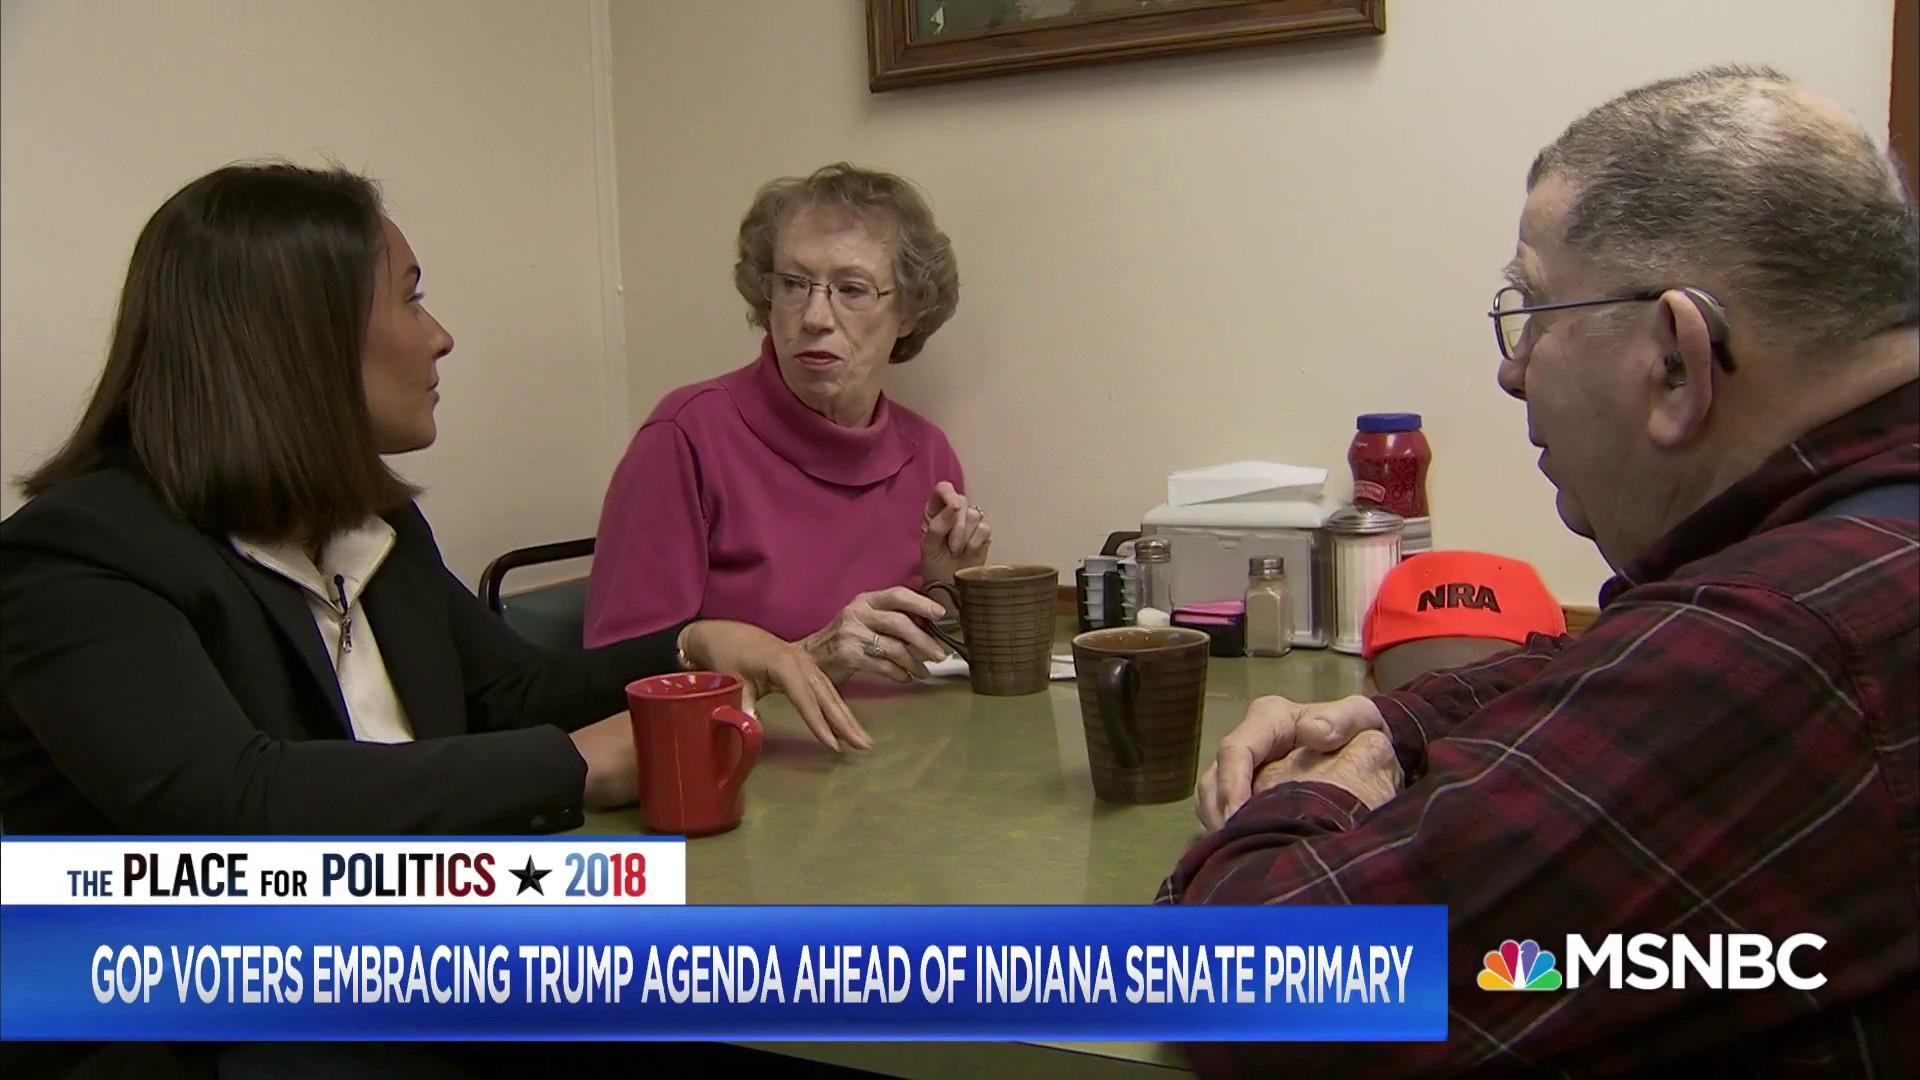 GOP candidates embrace Trump's agenda ahead of Indiana Senate primary